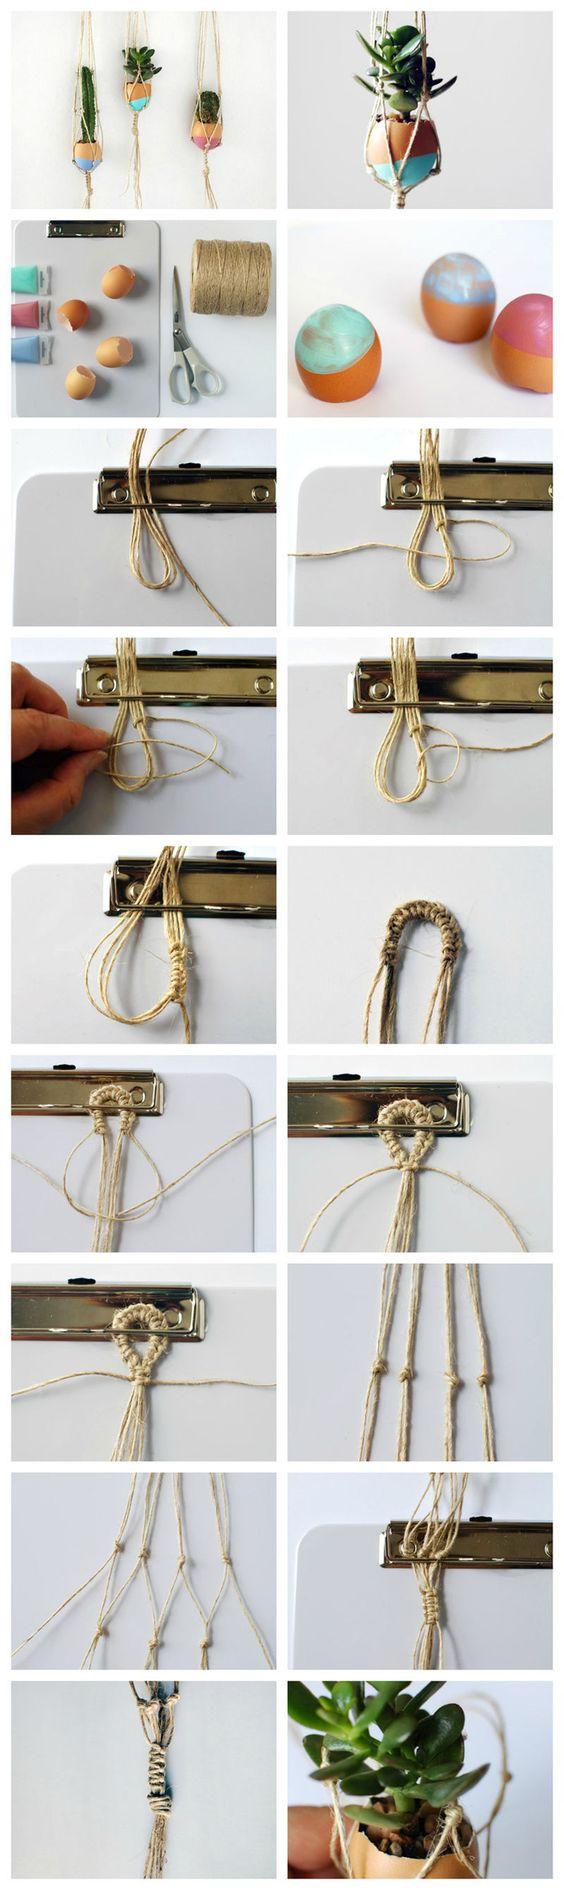 20 DIY Macrame Plant Hanger Patterns | Craft ideas ...